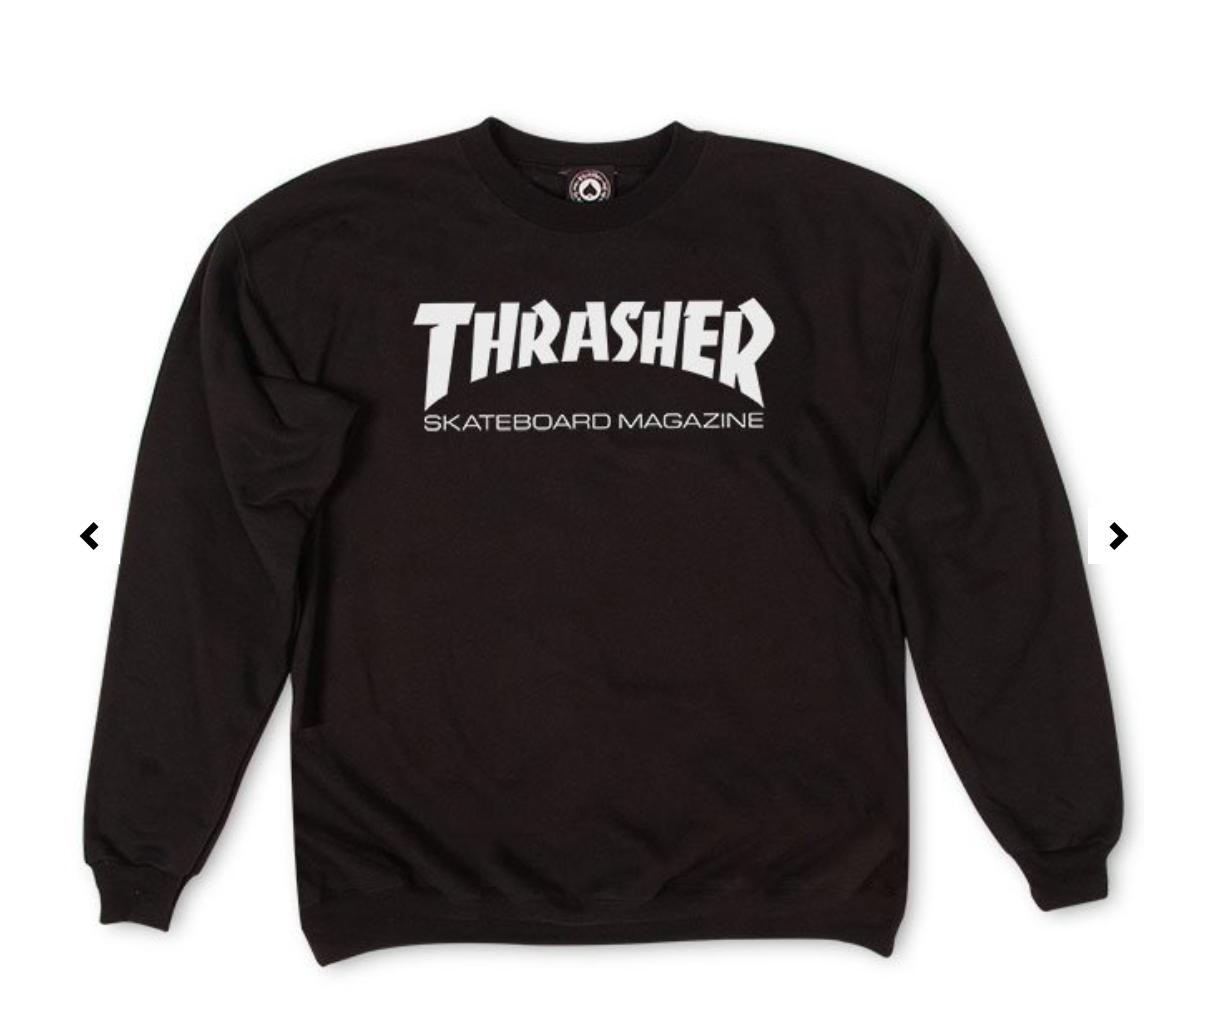 Skate Mag Crewneck Black In 2020 Sweatshirts Crew Neck Sweatshirt Black Sweatshirts [ 1026 x 1210 Pixel ]